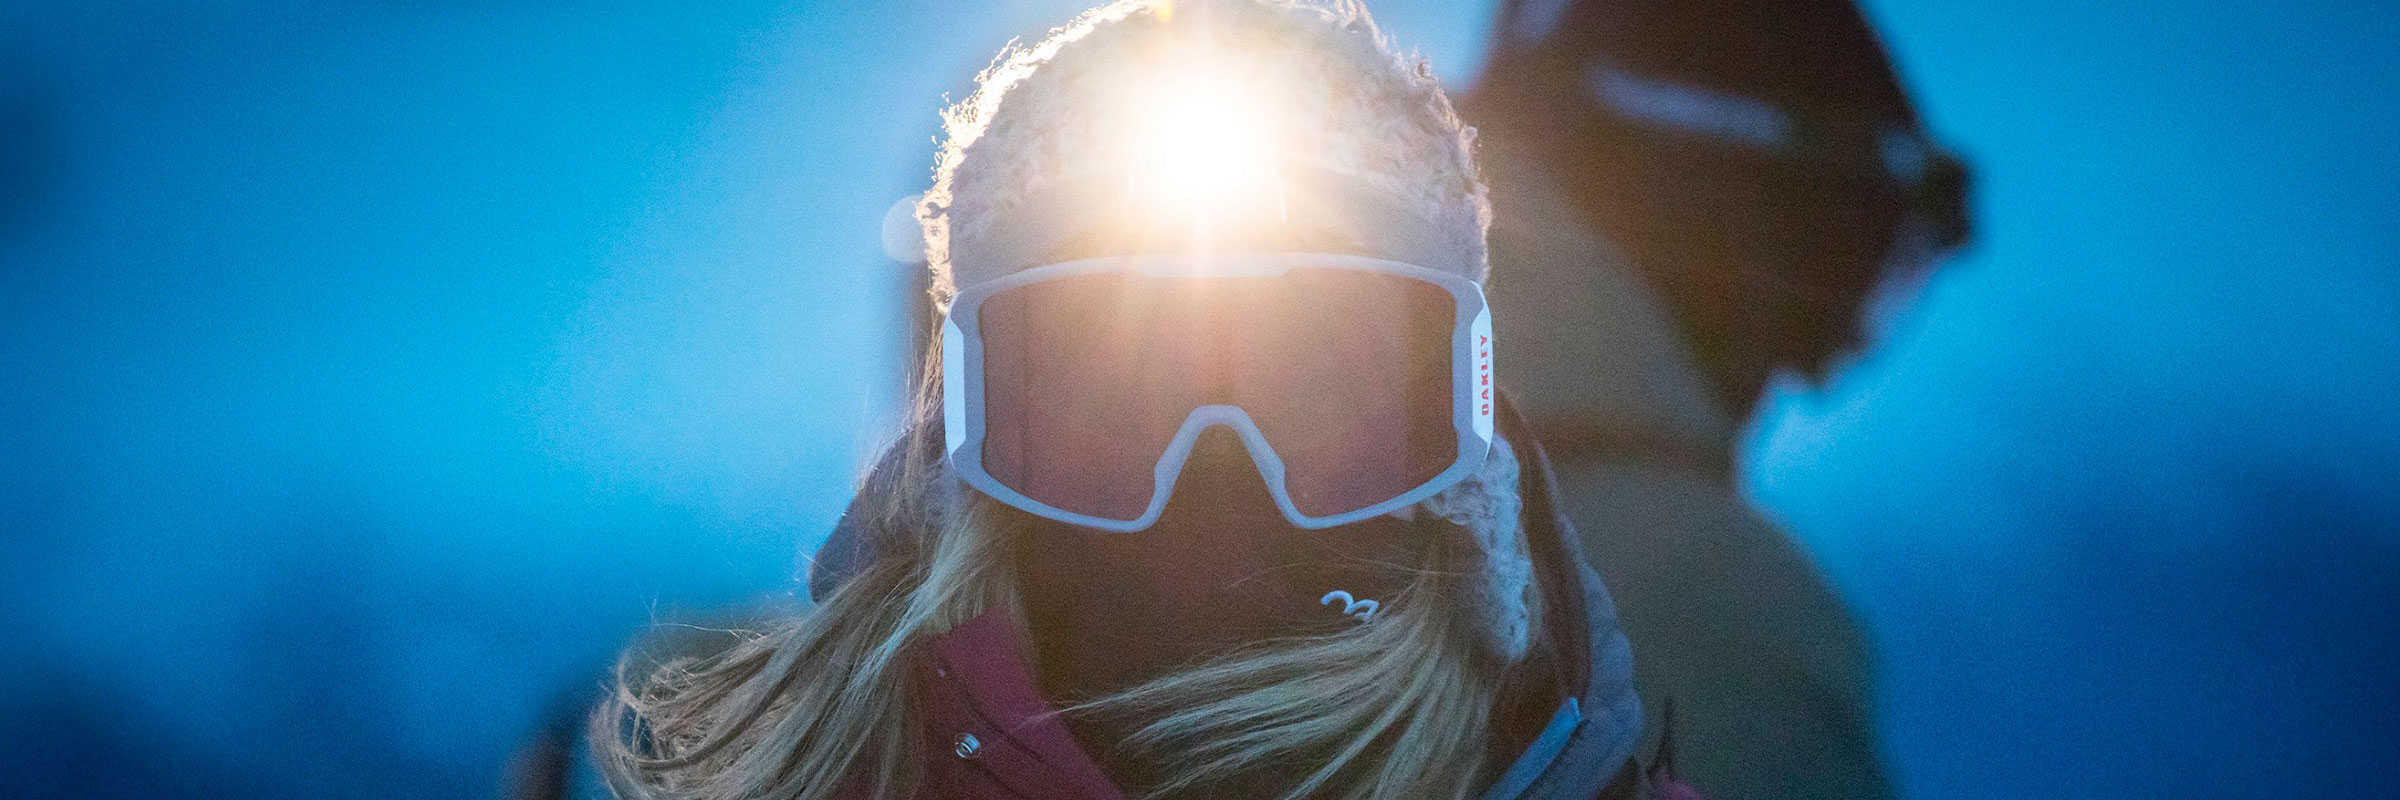 Anon, Oakley, Ski & snowboard, Spy. Comment choisir vos lunettes de ski